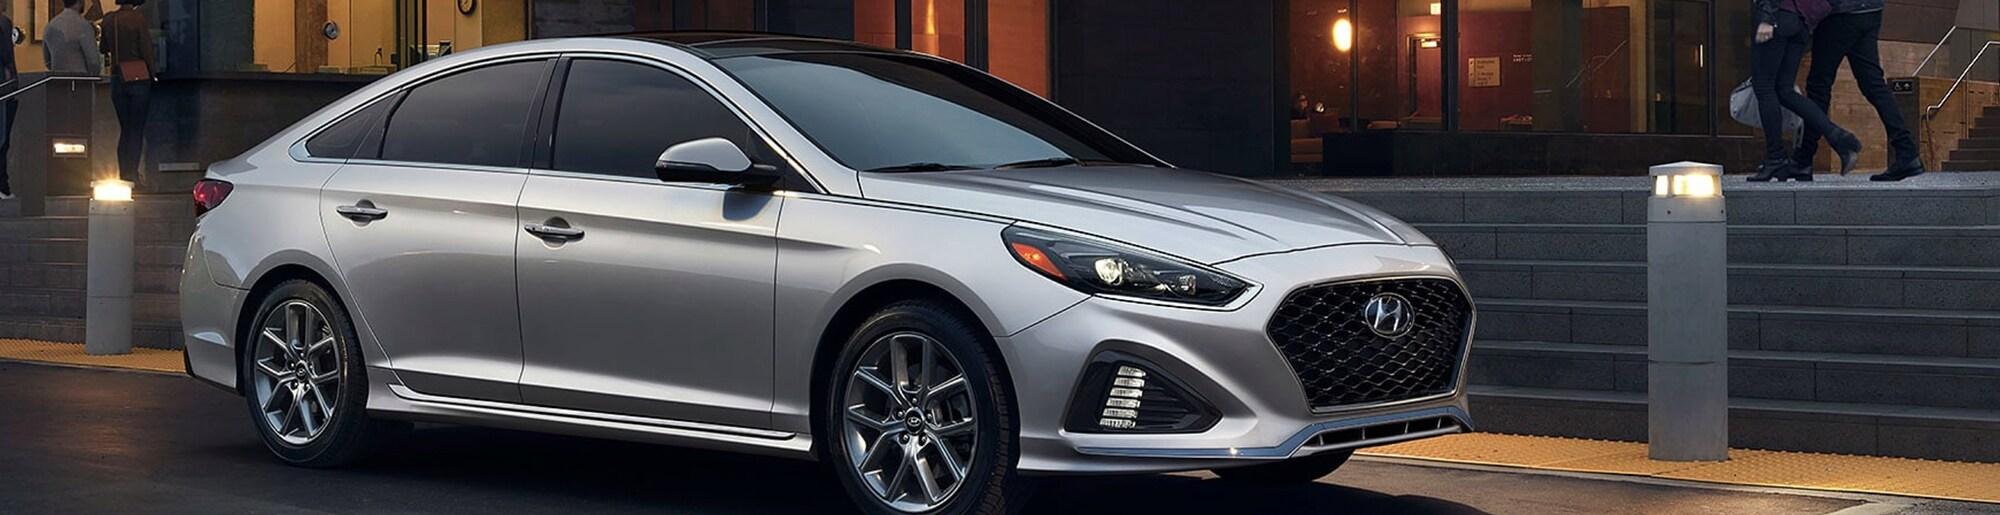 2019 Hyundai Sonata Allen Hyundai Hyundai Dealer In Mississippi